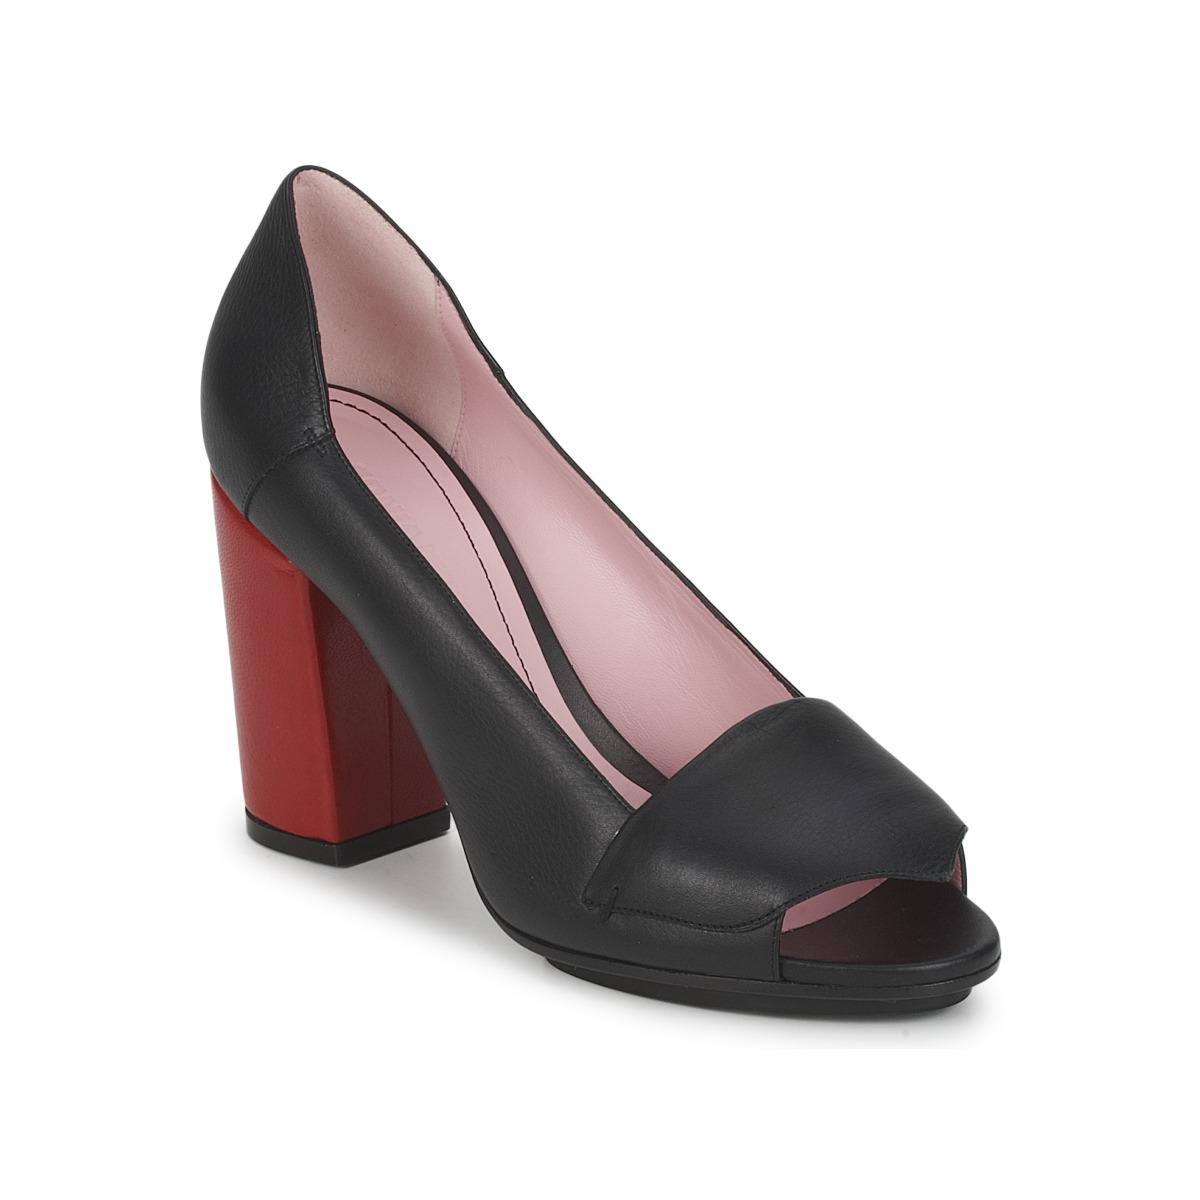 Court-shoes Sonia Rykiel 657940 Black / Red